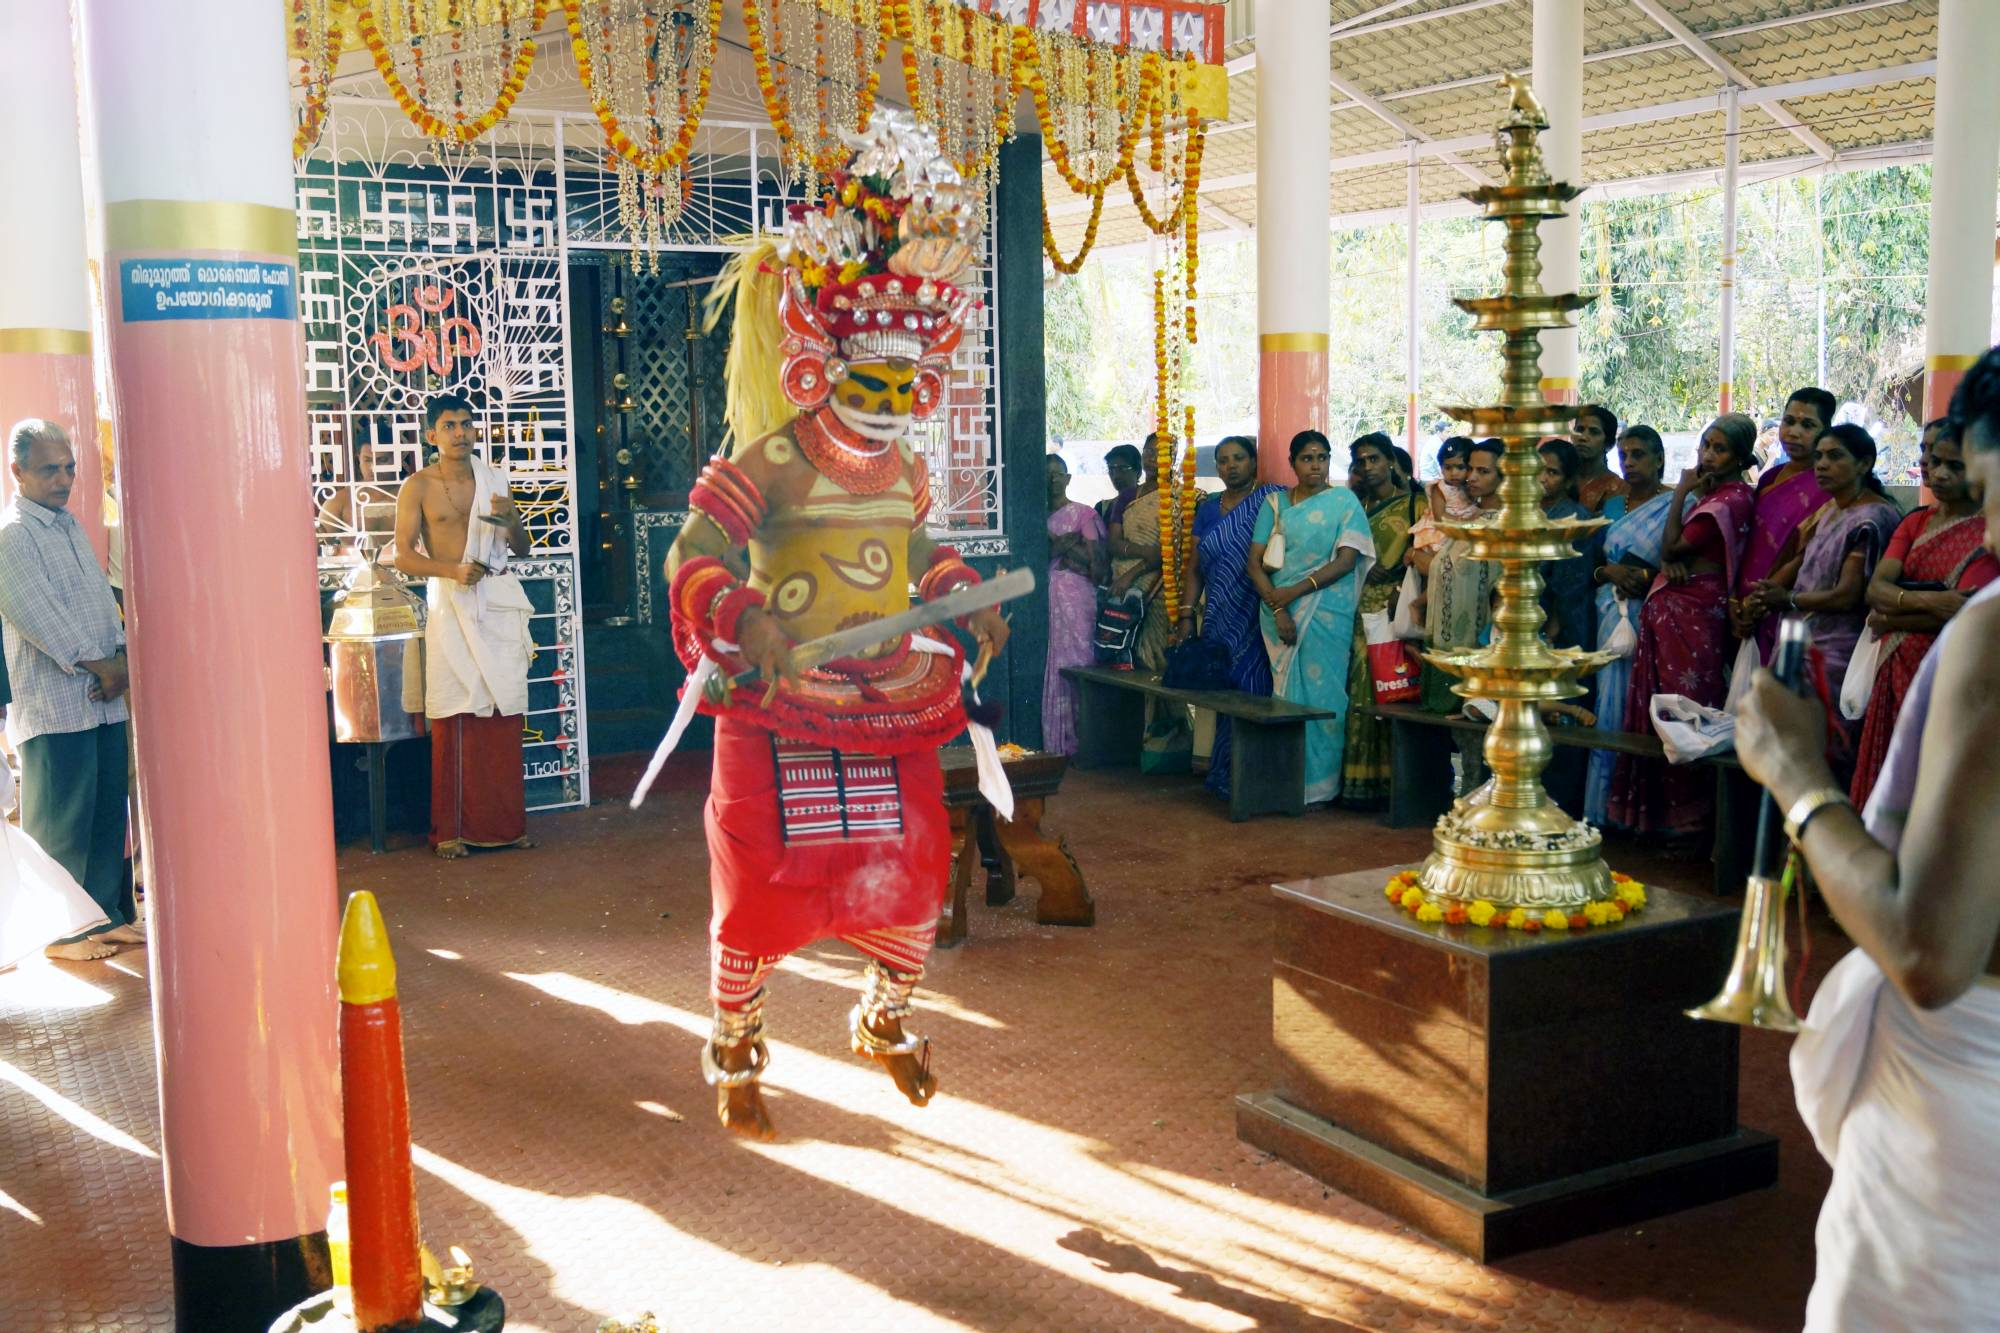 Mutapa podczas ceremonii